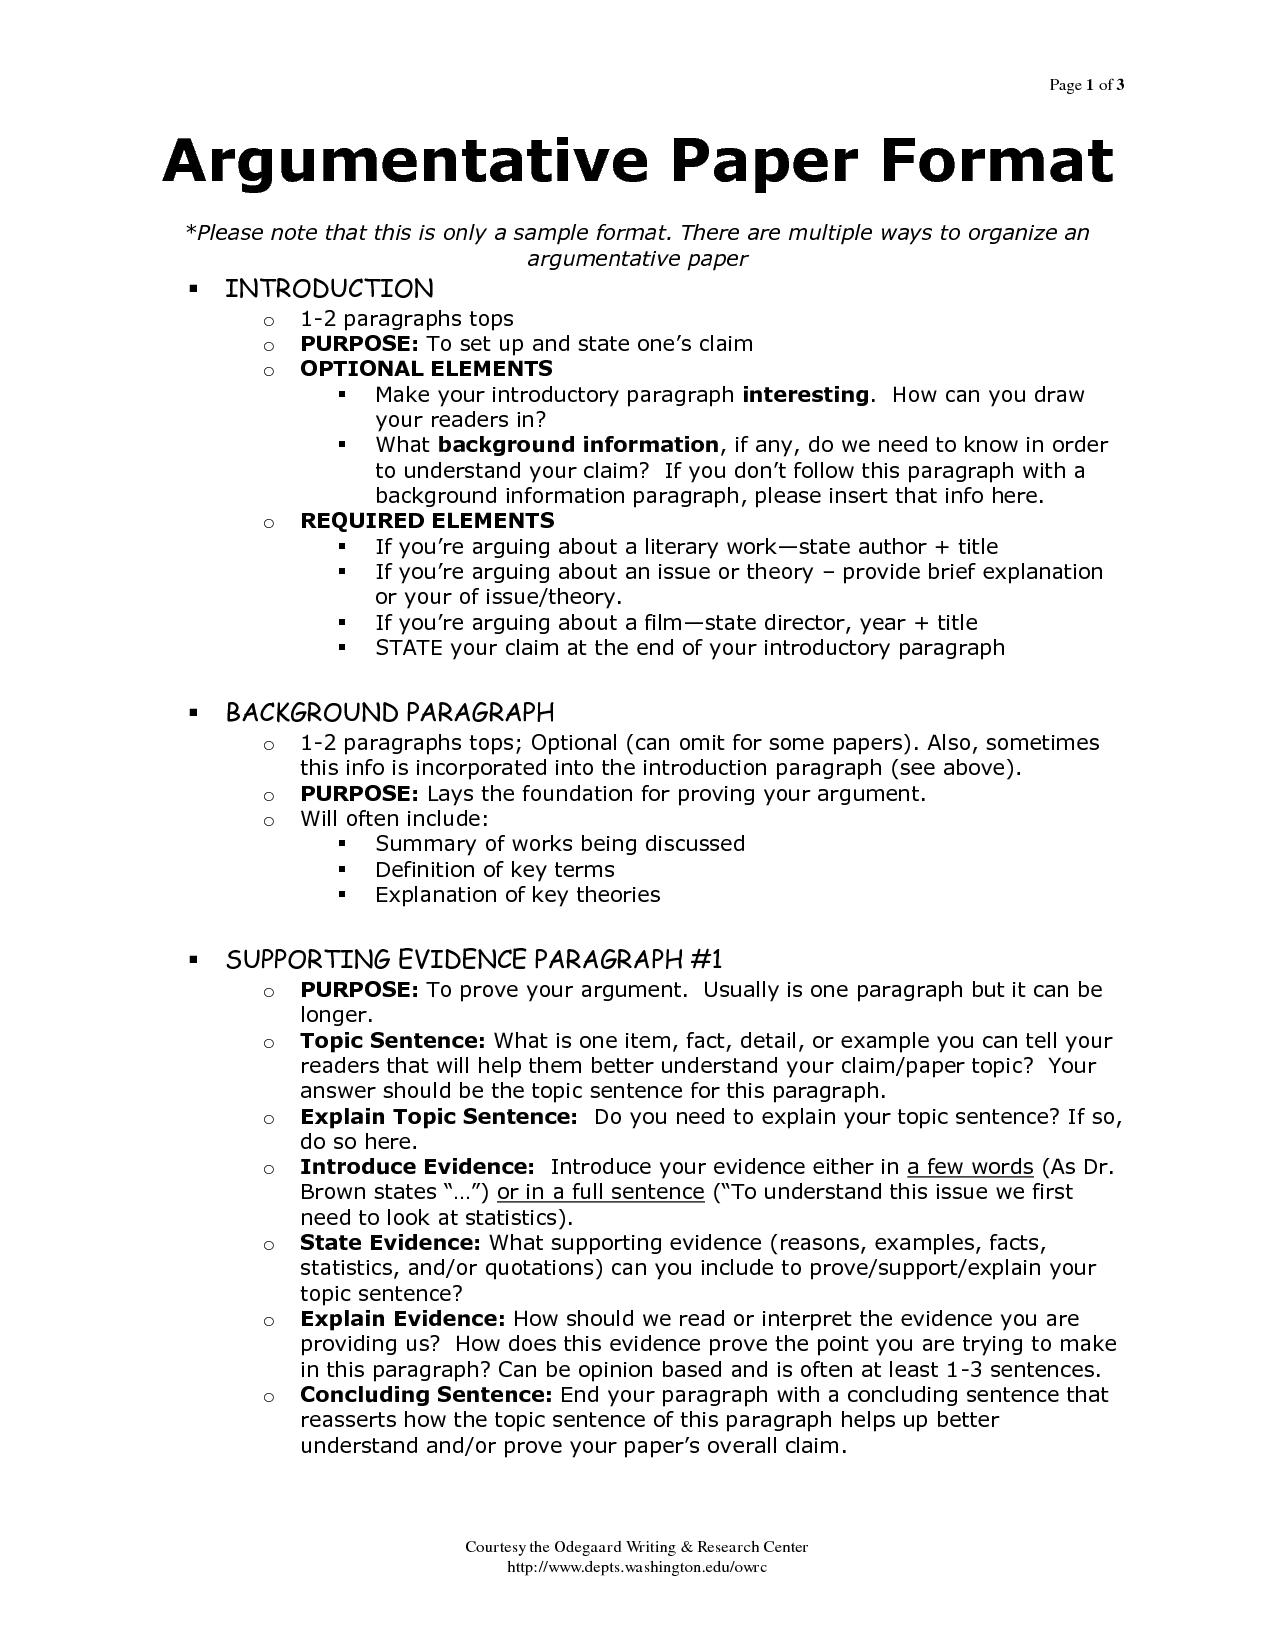 003 Essay Example Argument Remarkable Outline Template Argumentative Pdf Full